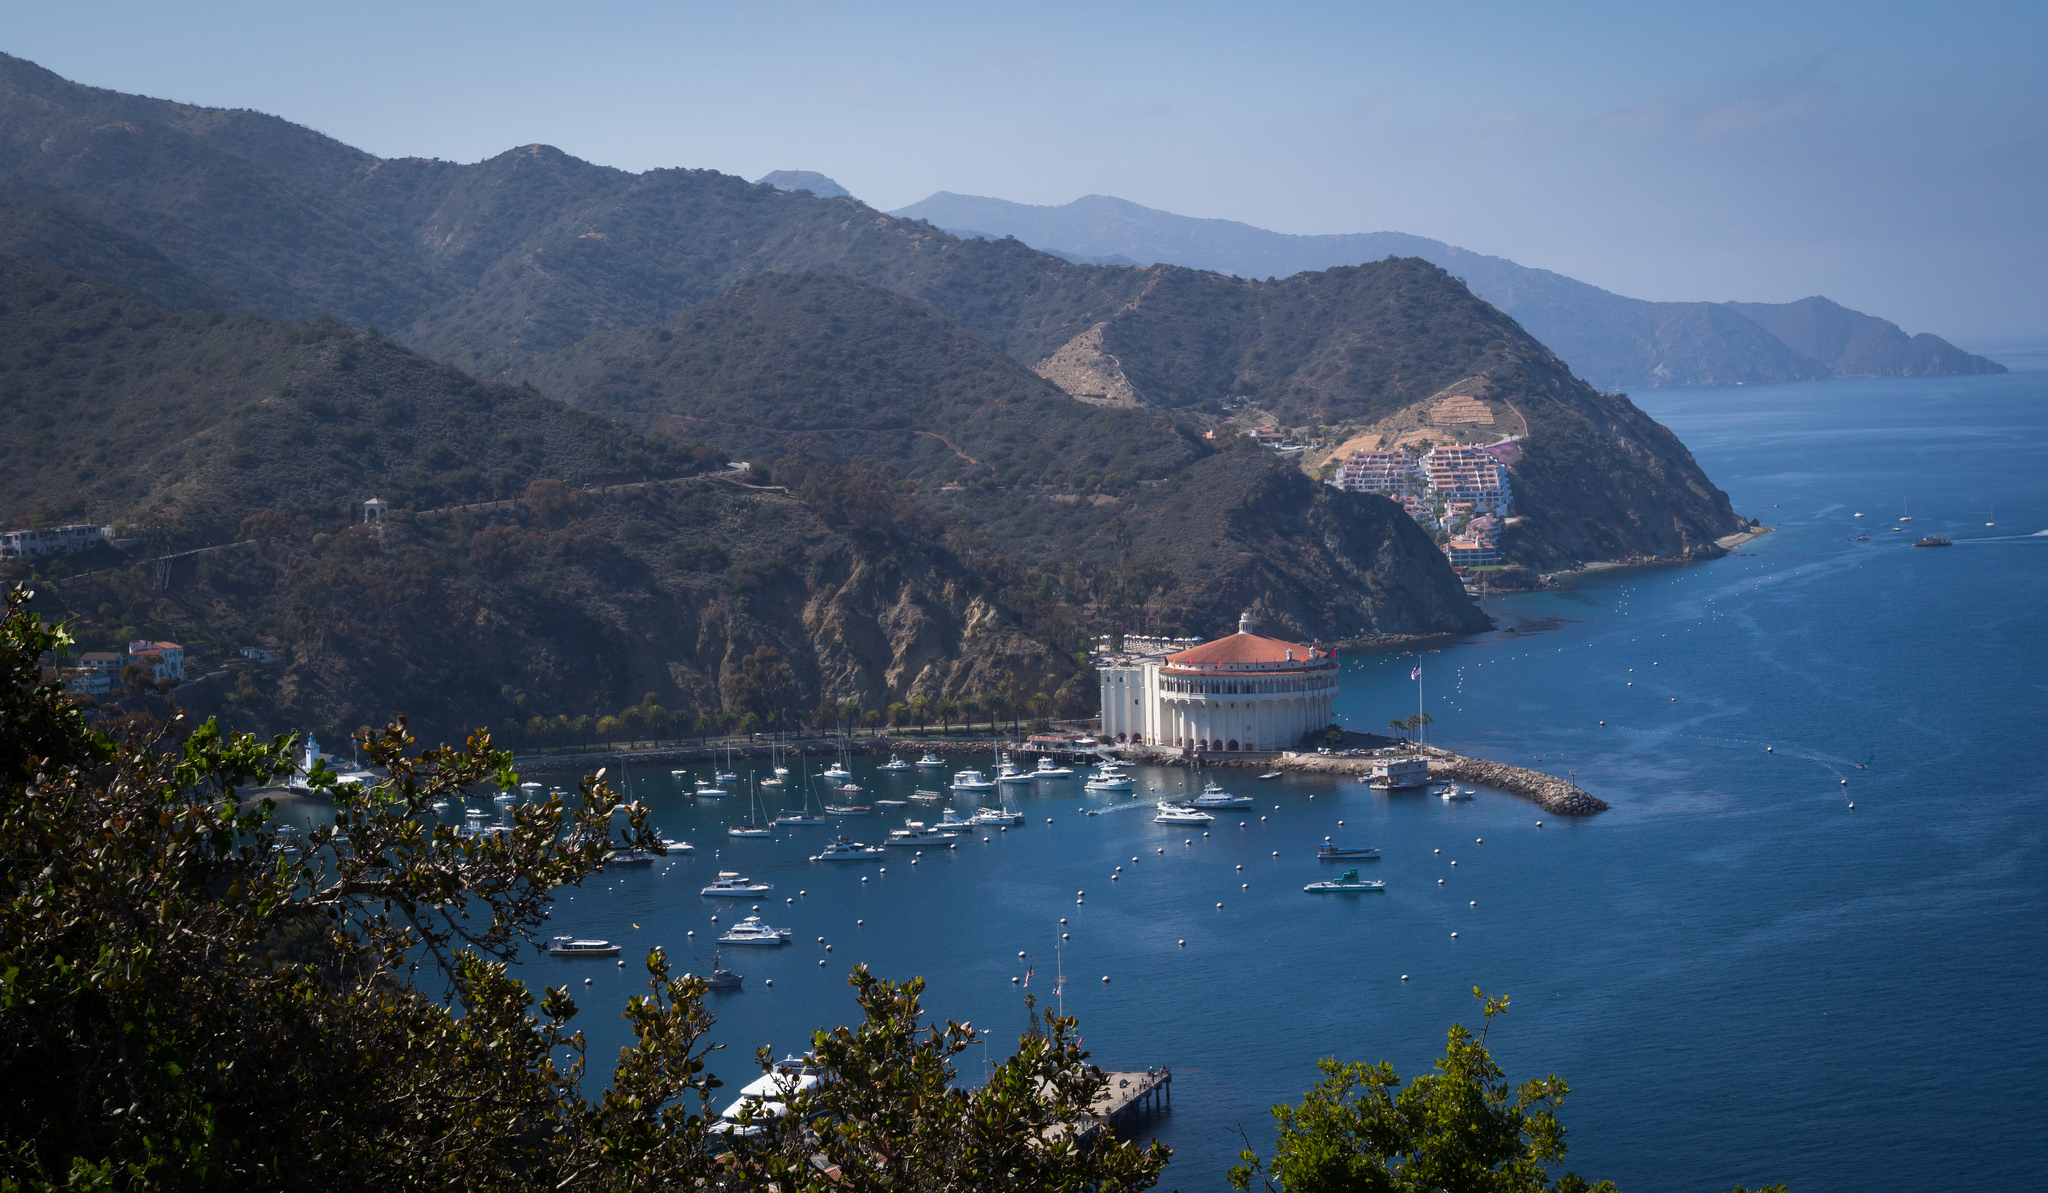 Catalina Island   https://www.flickr.com/photos/staticantics/13966191744/